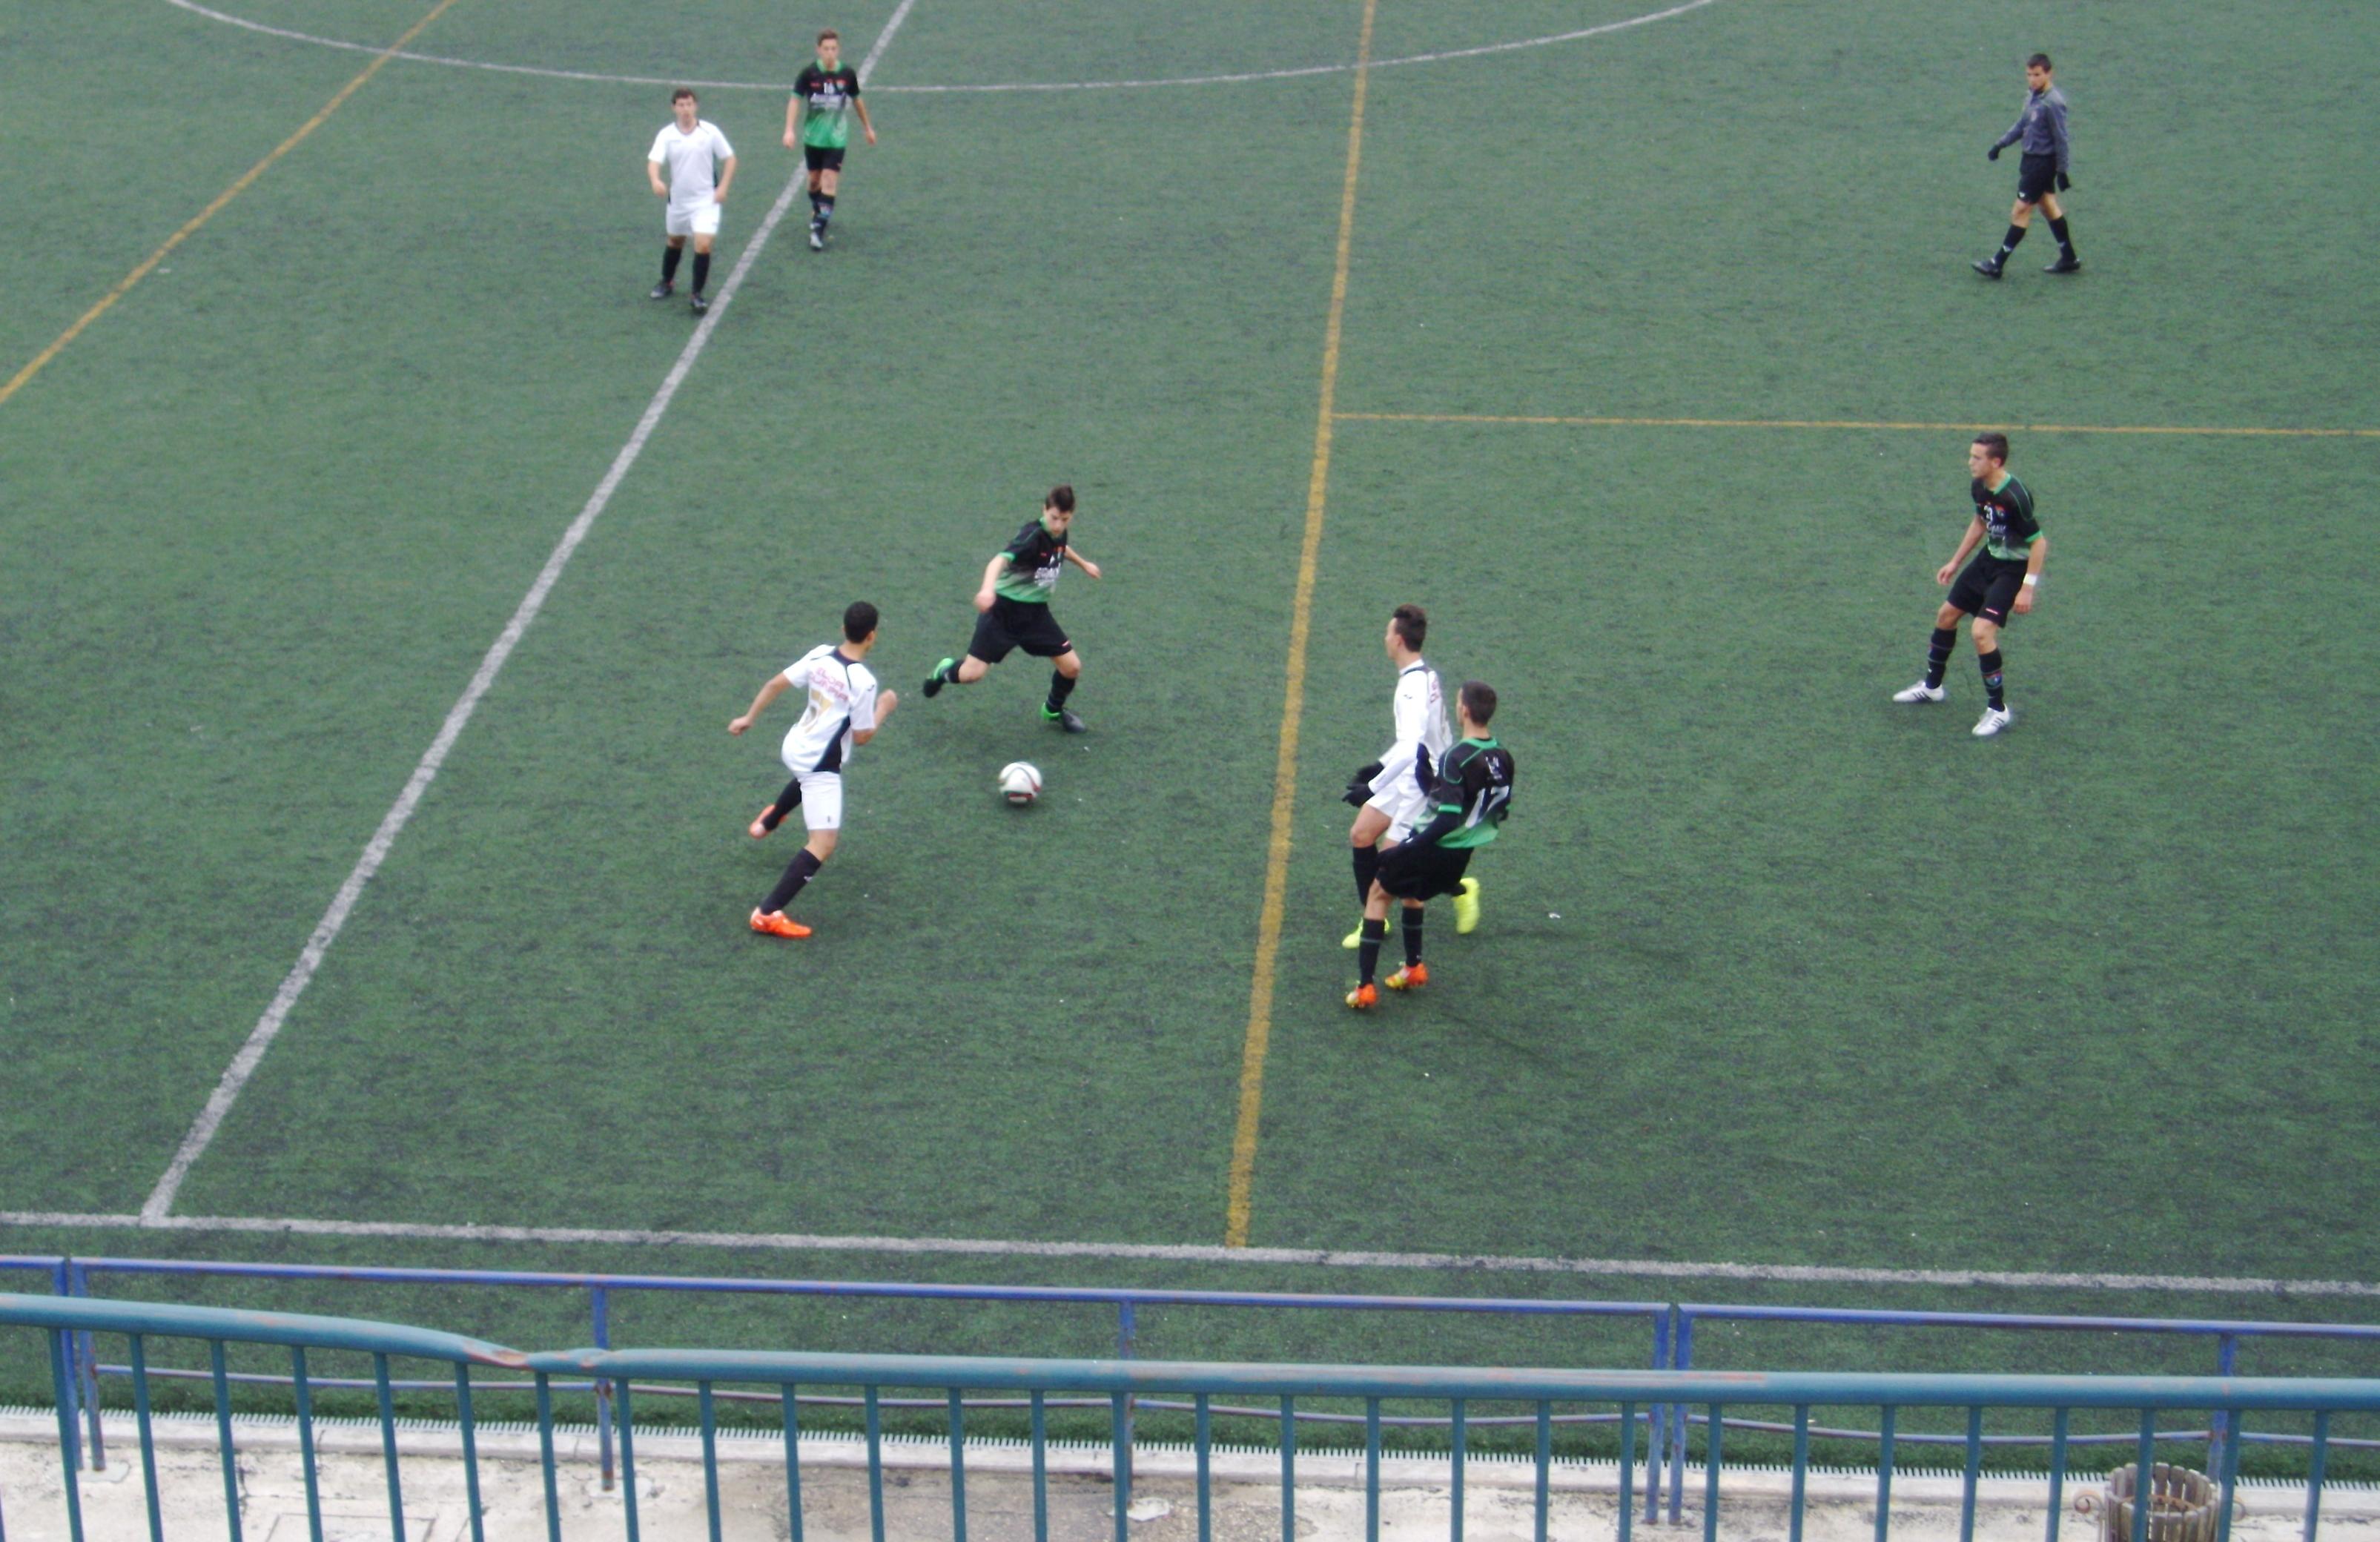 Crónica y fotos del partido de liga EDM Juvenil D 3 – 1 Elida Olimpia A